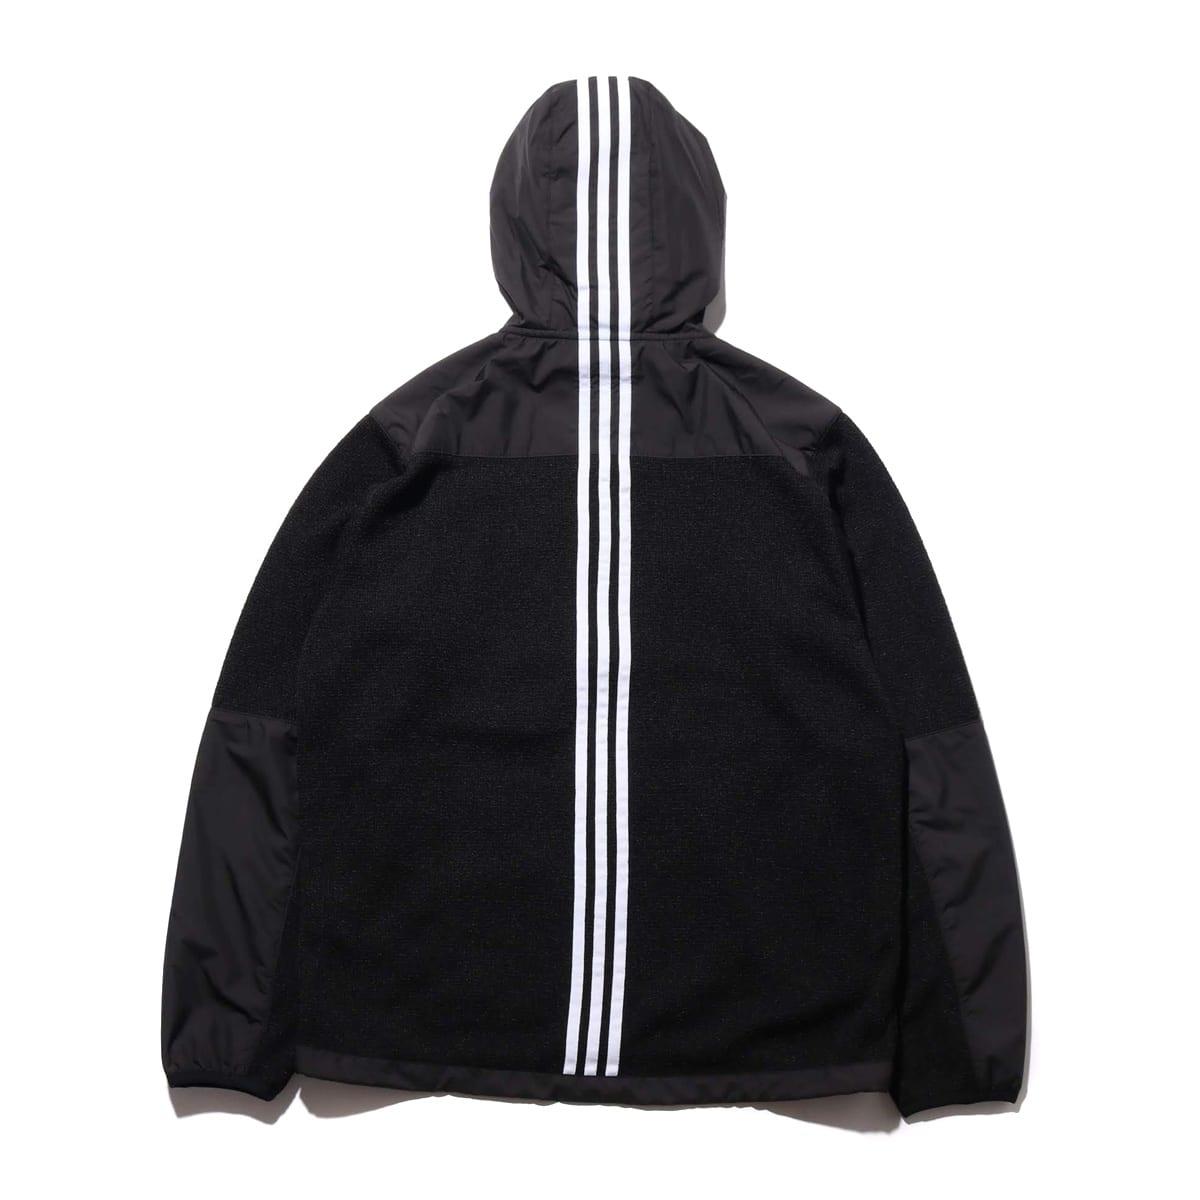 """adidas M HB JK atmos  BLACK 18FW-S""_photo_2"